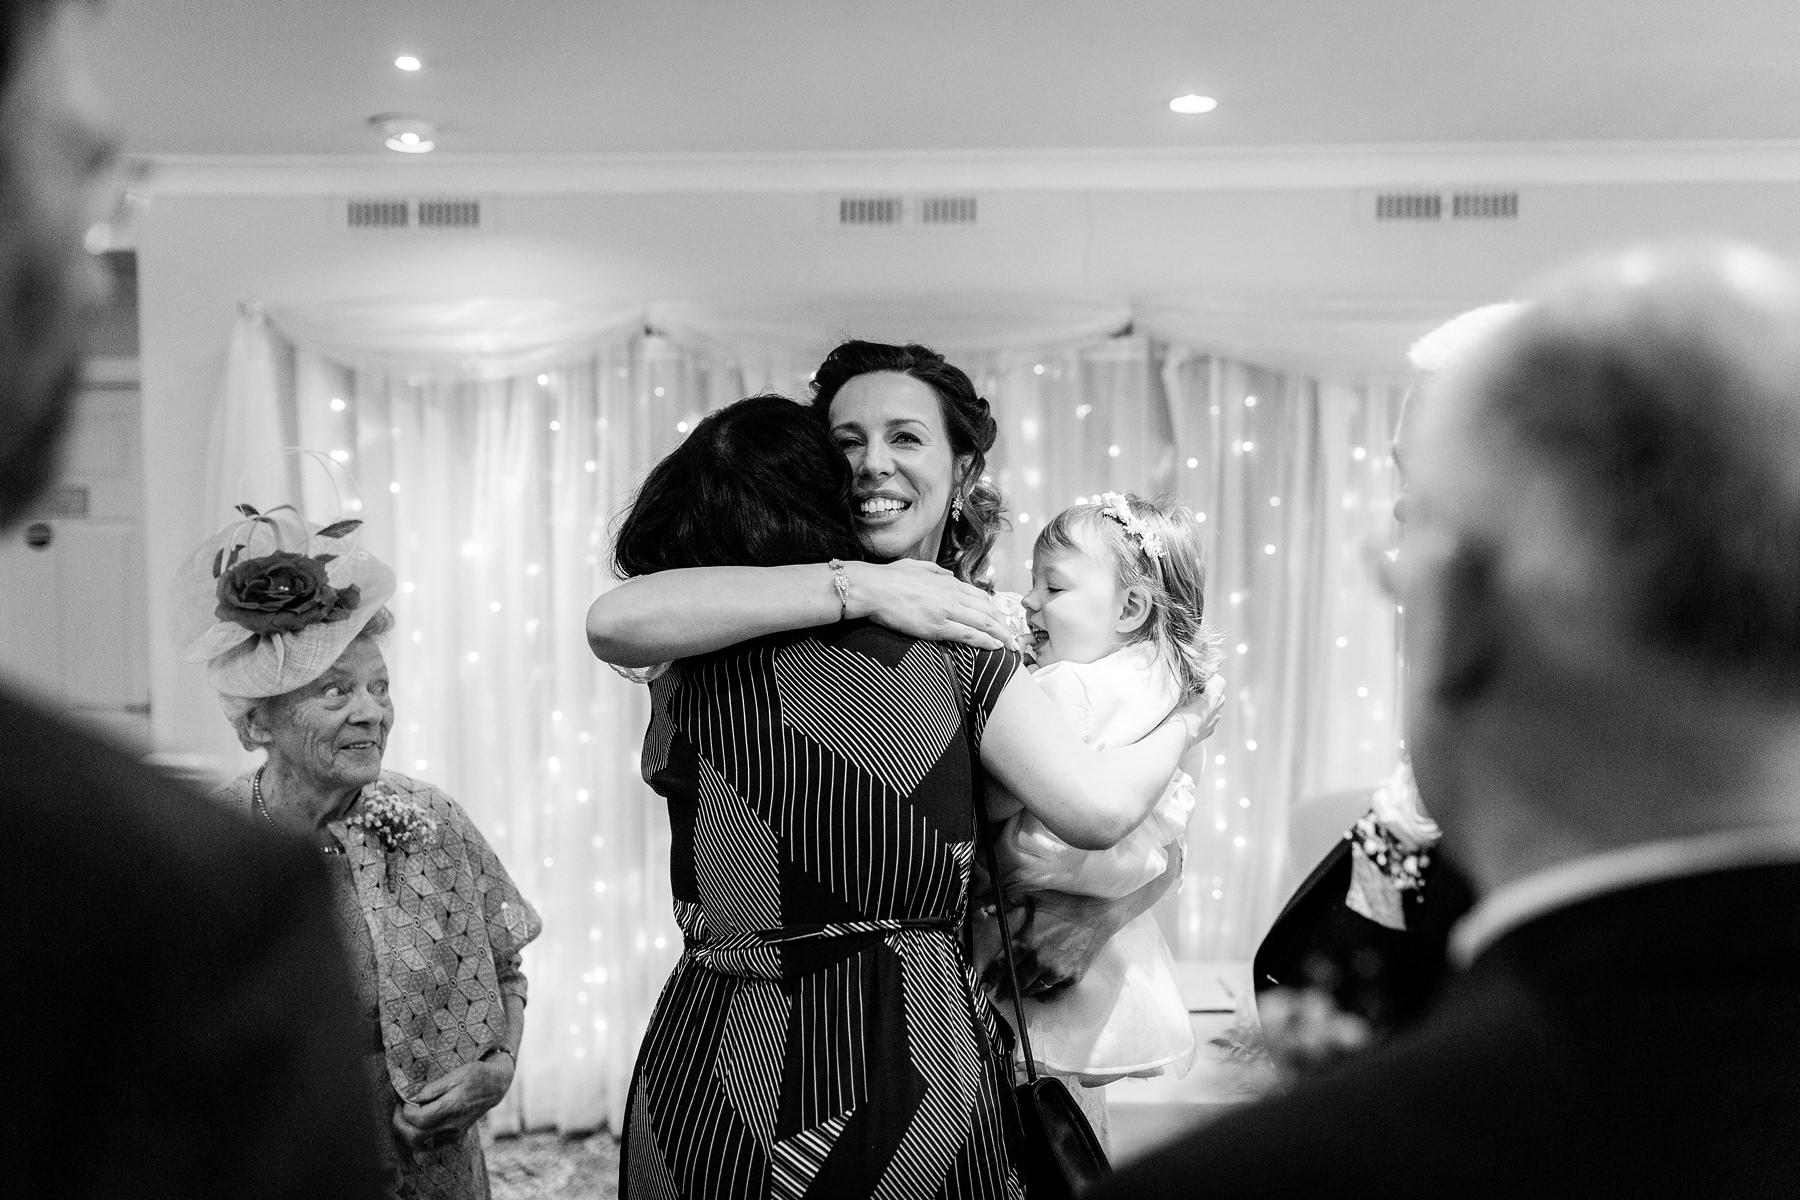 intimate-wedding-at-kilhey-court-lancashire-photographer_0014.jpg